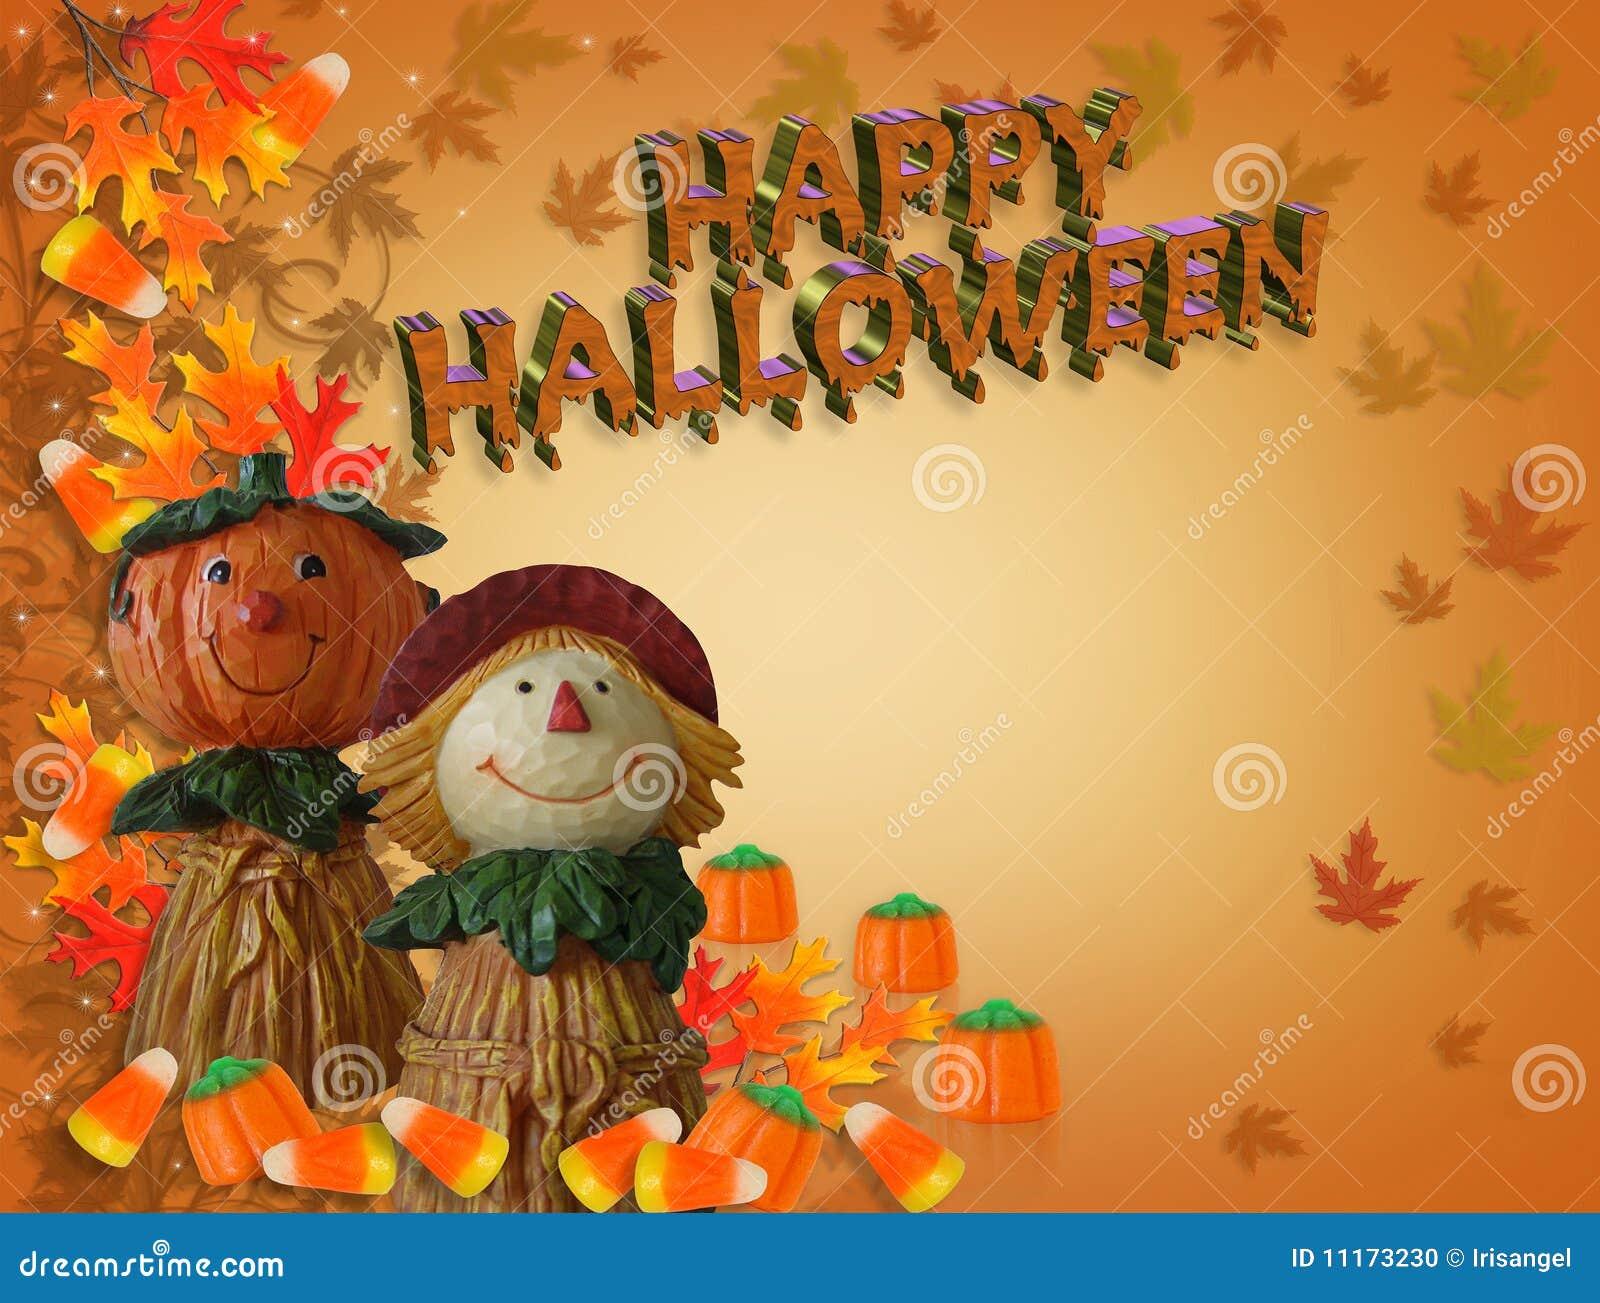 Happy Halloween Card Pumpkin Scarecrow Stock Photo   Image: 11173230